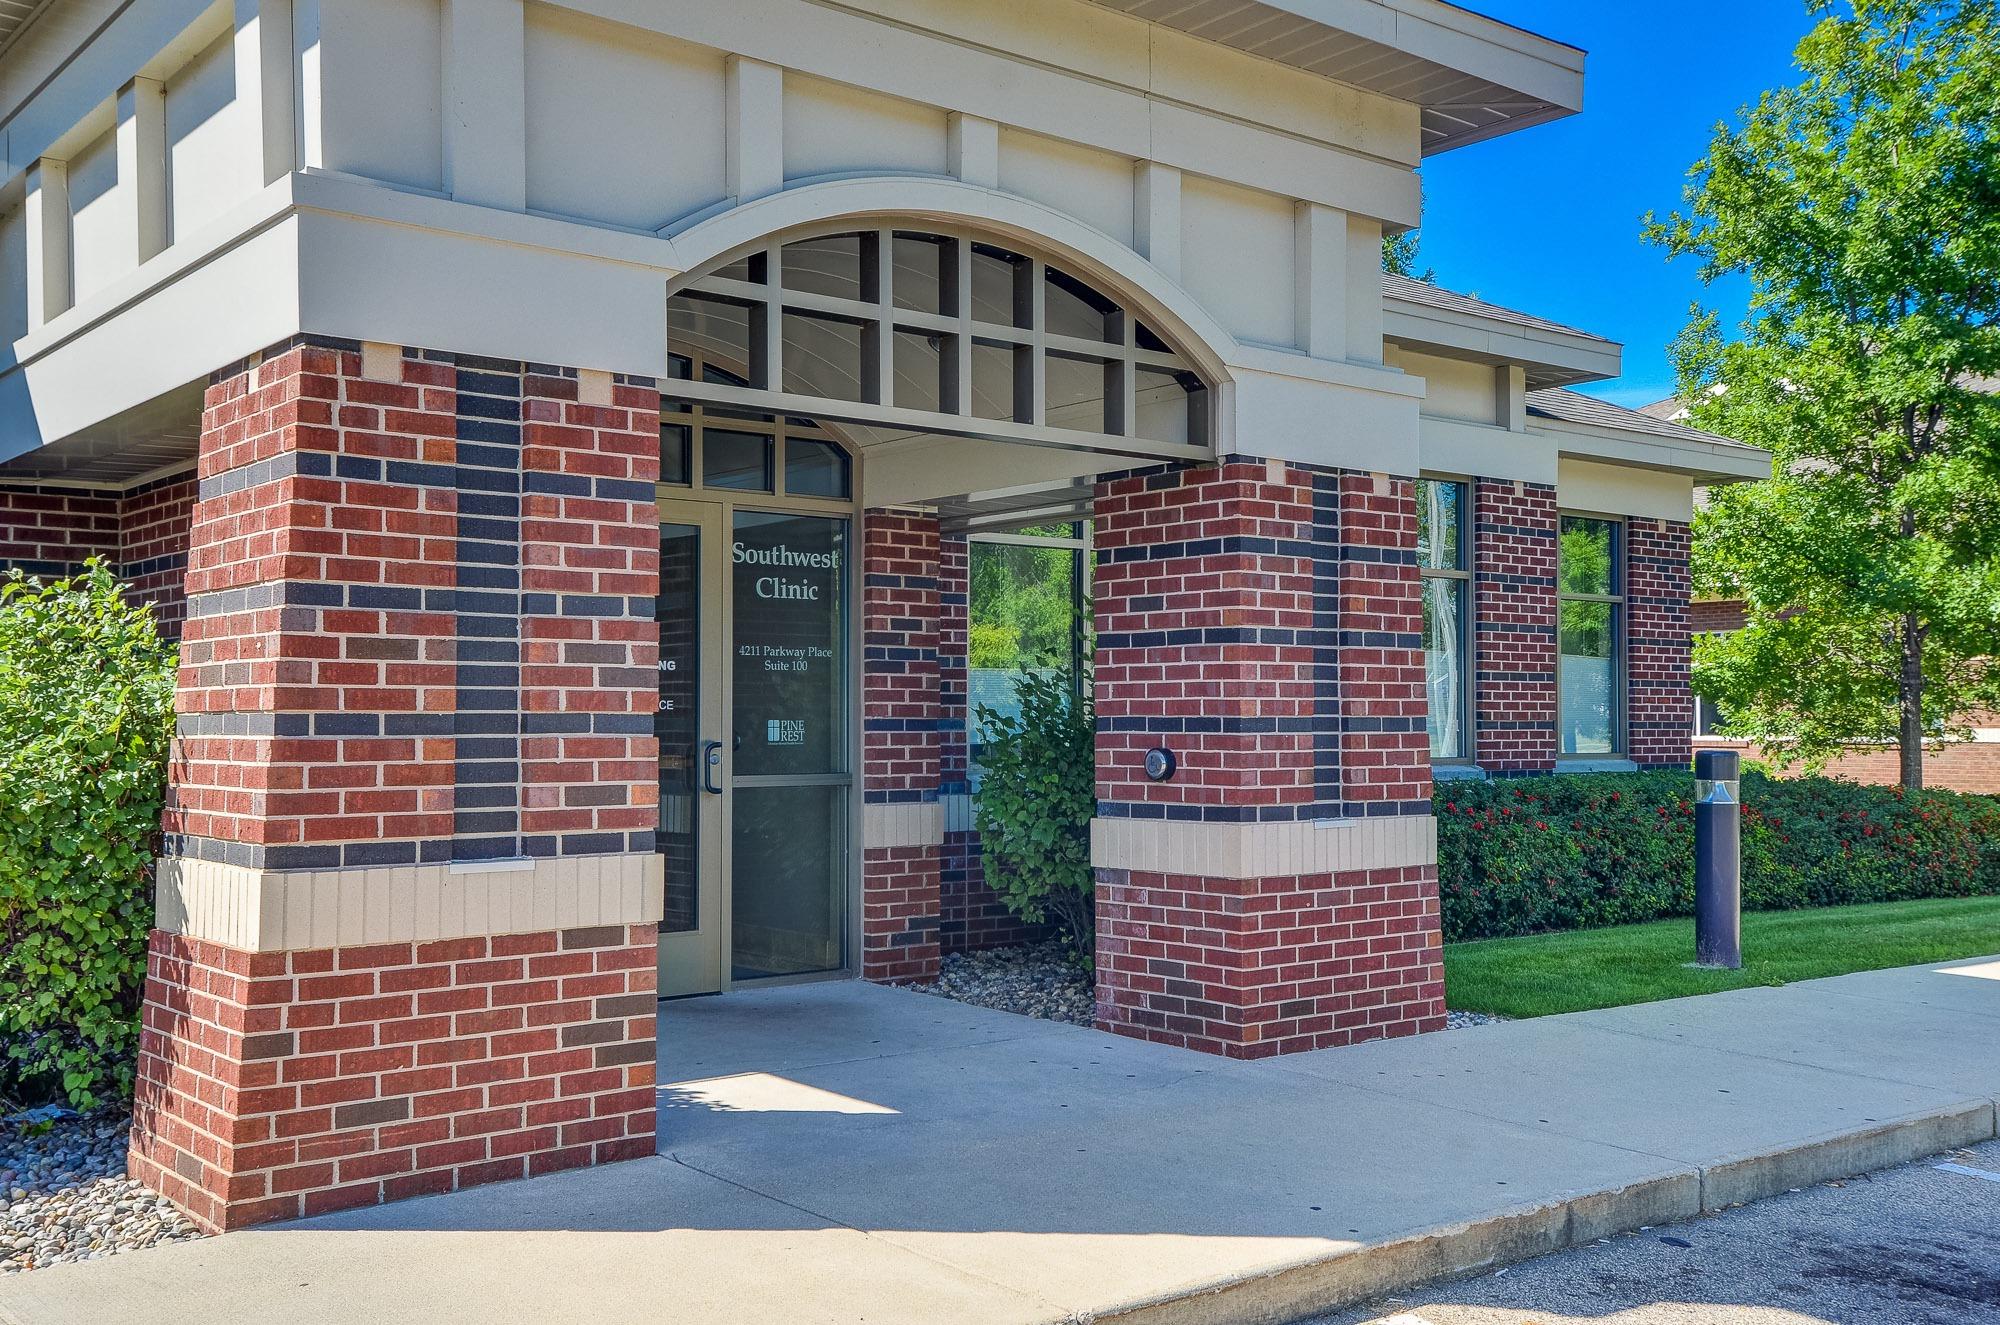 Southwest Clinic entrance